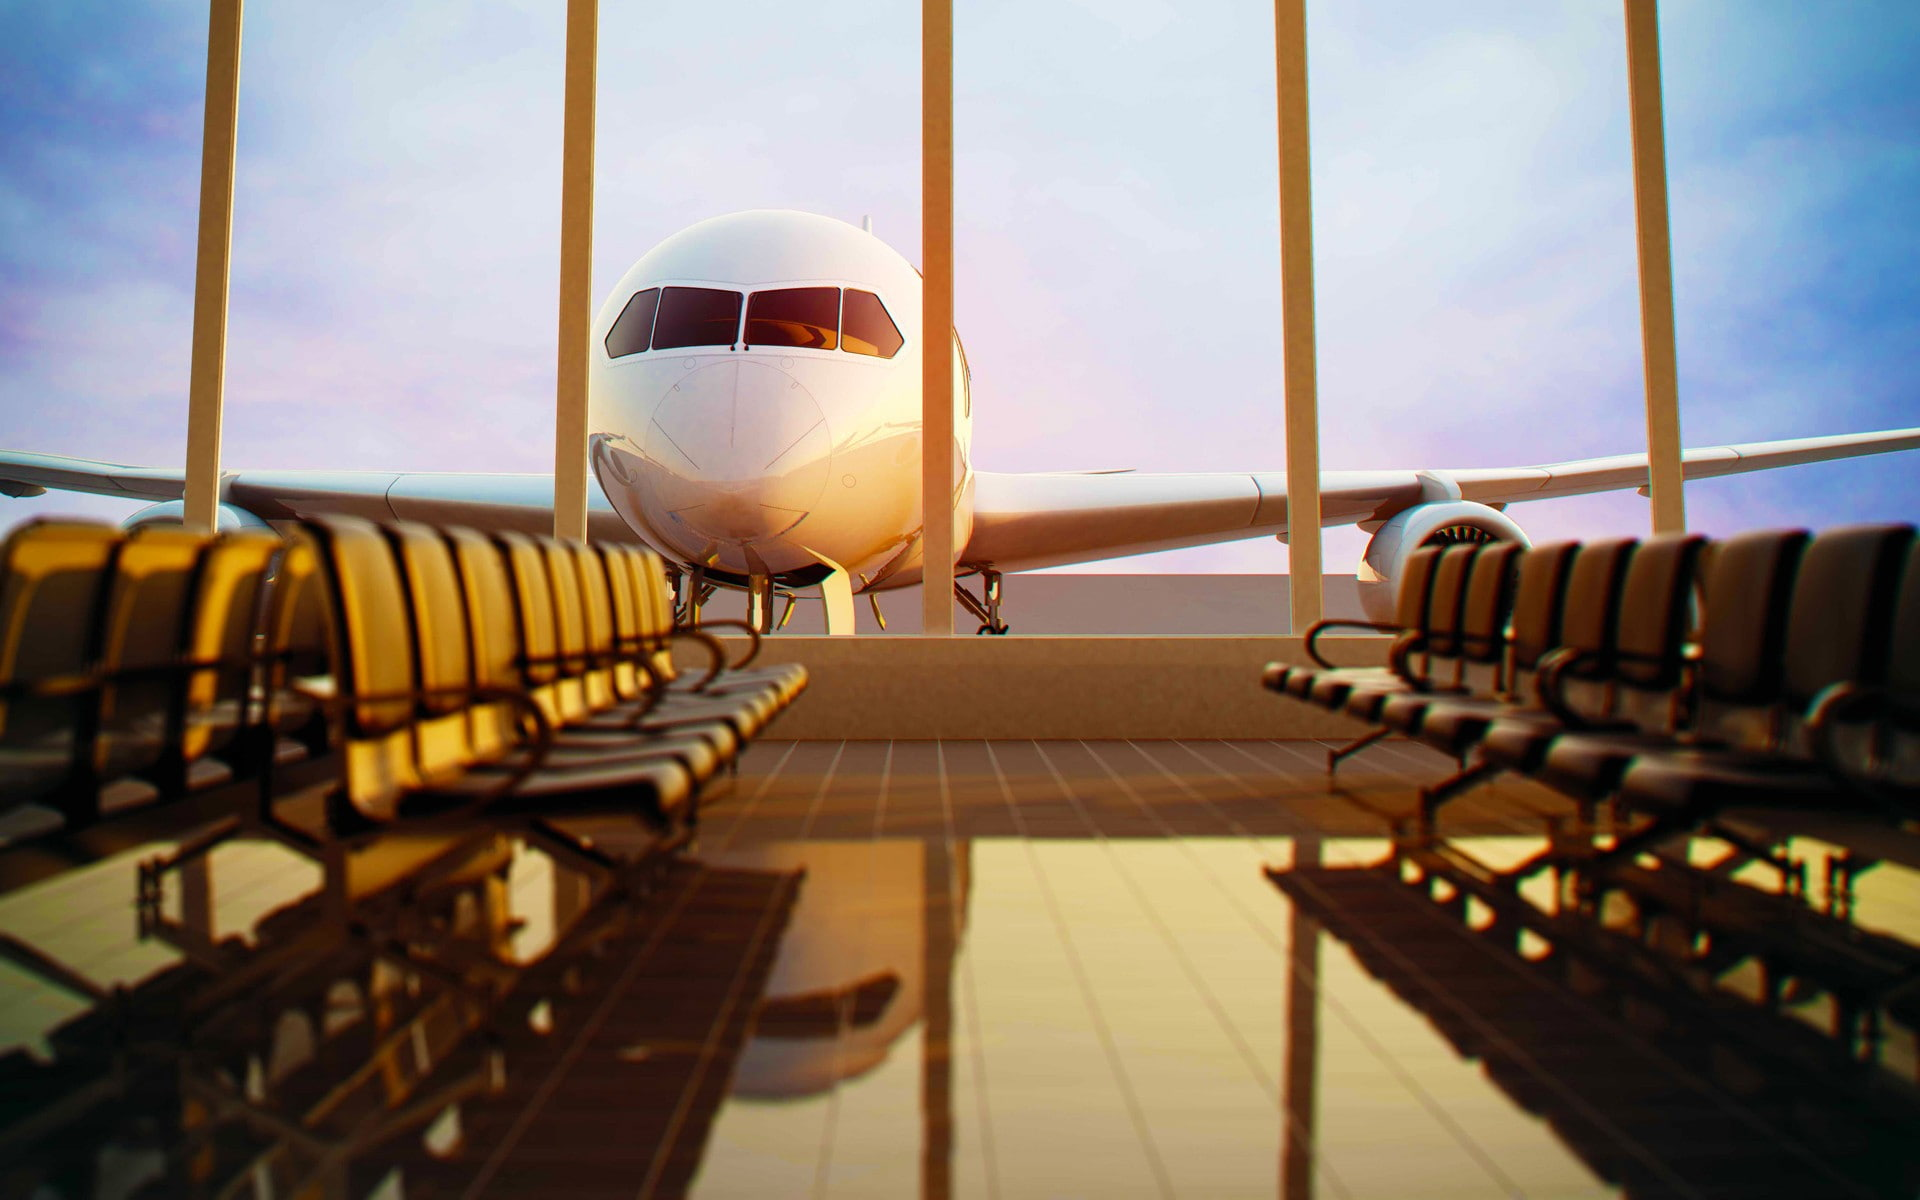 airplane passenger aircraft chair airport wallpaper 32f142905df63e8b2aa892c5e048d992